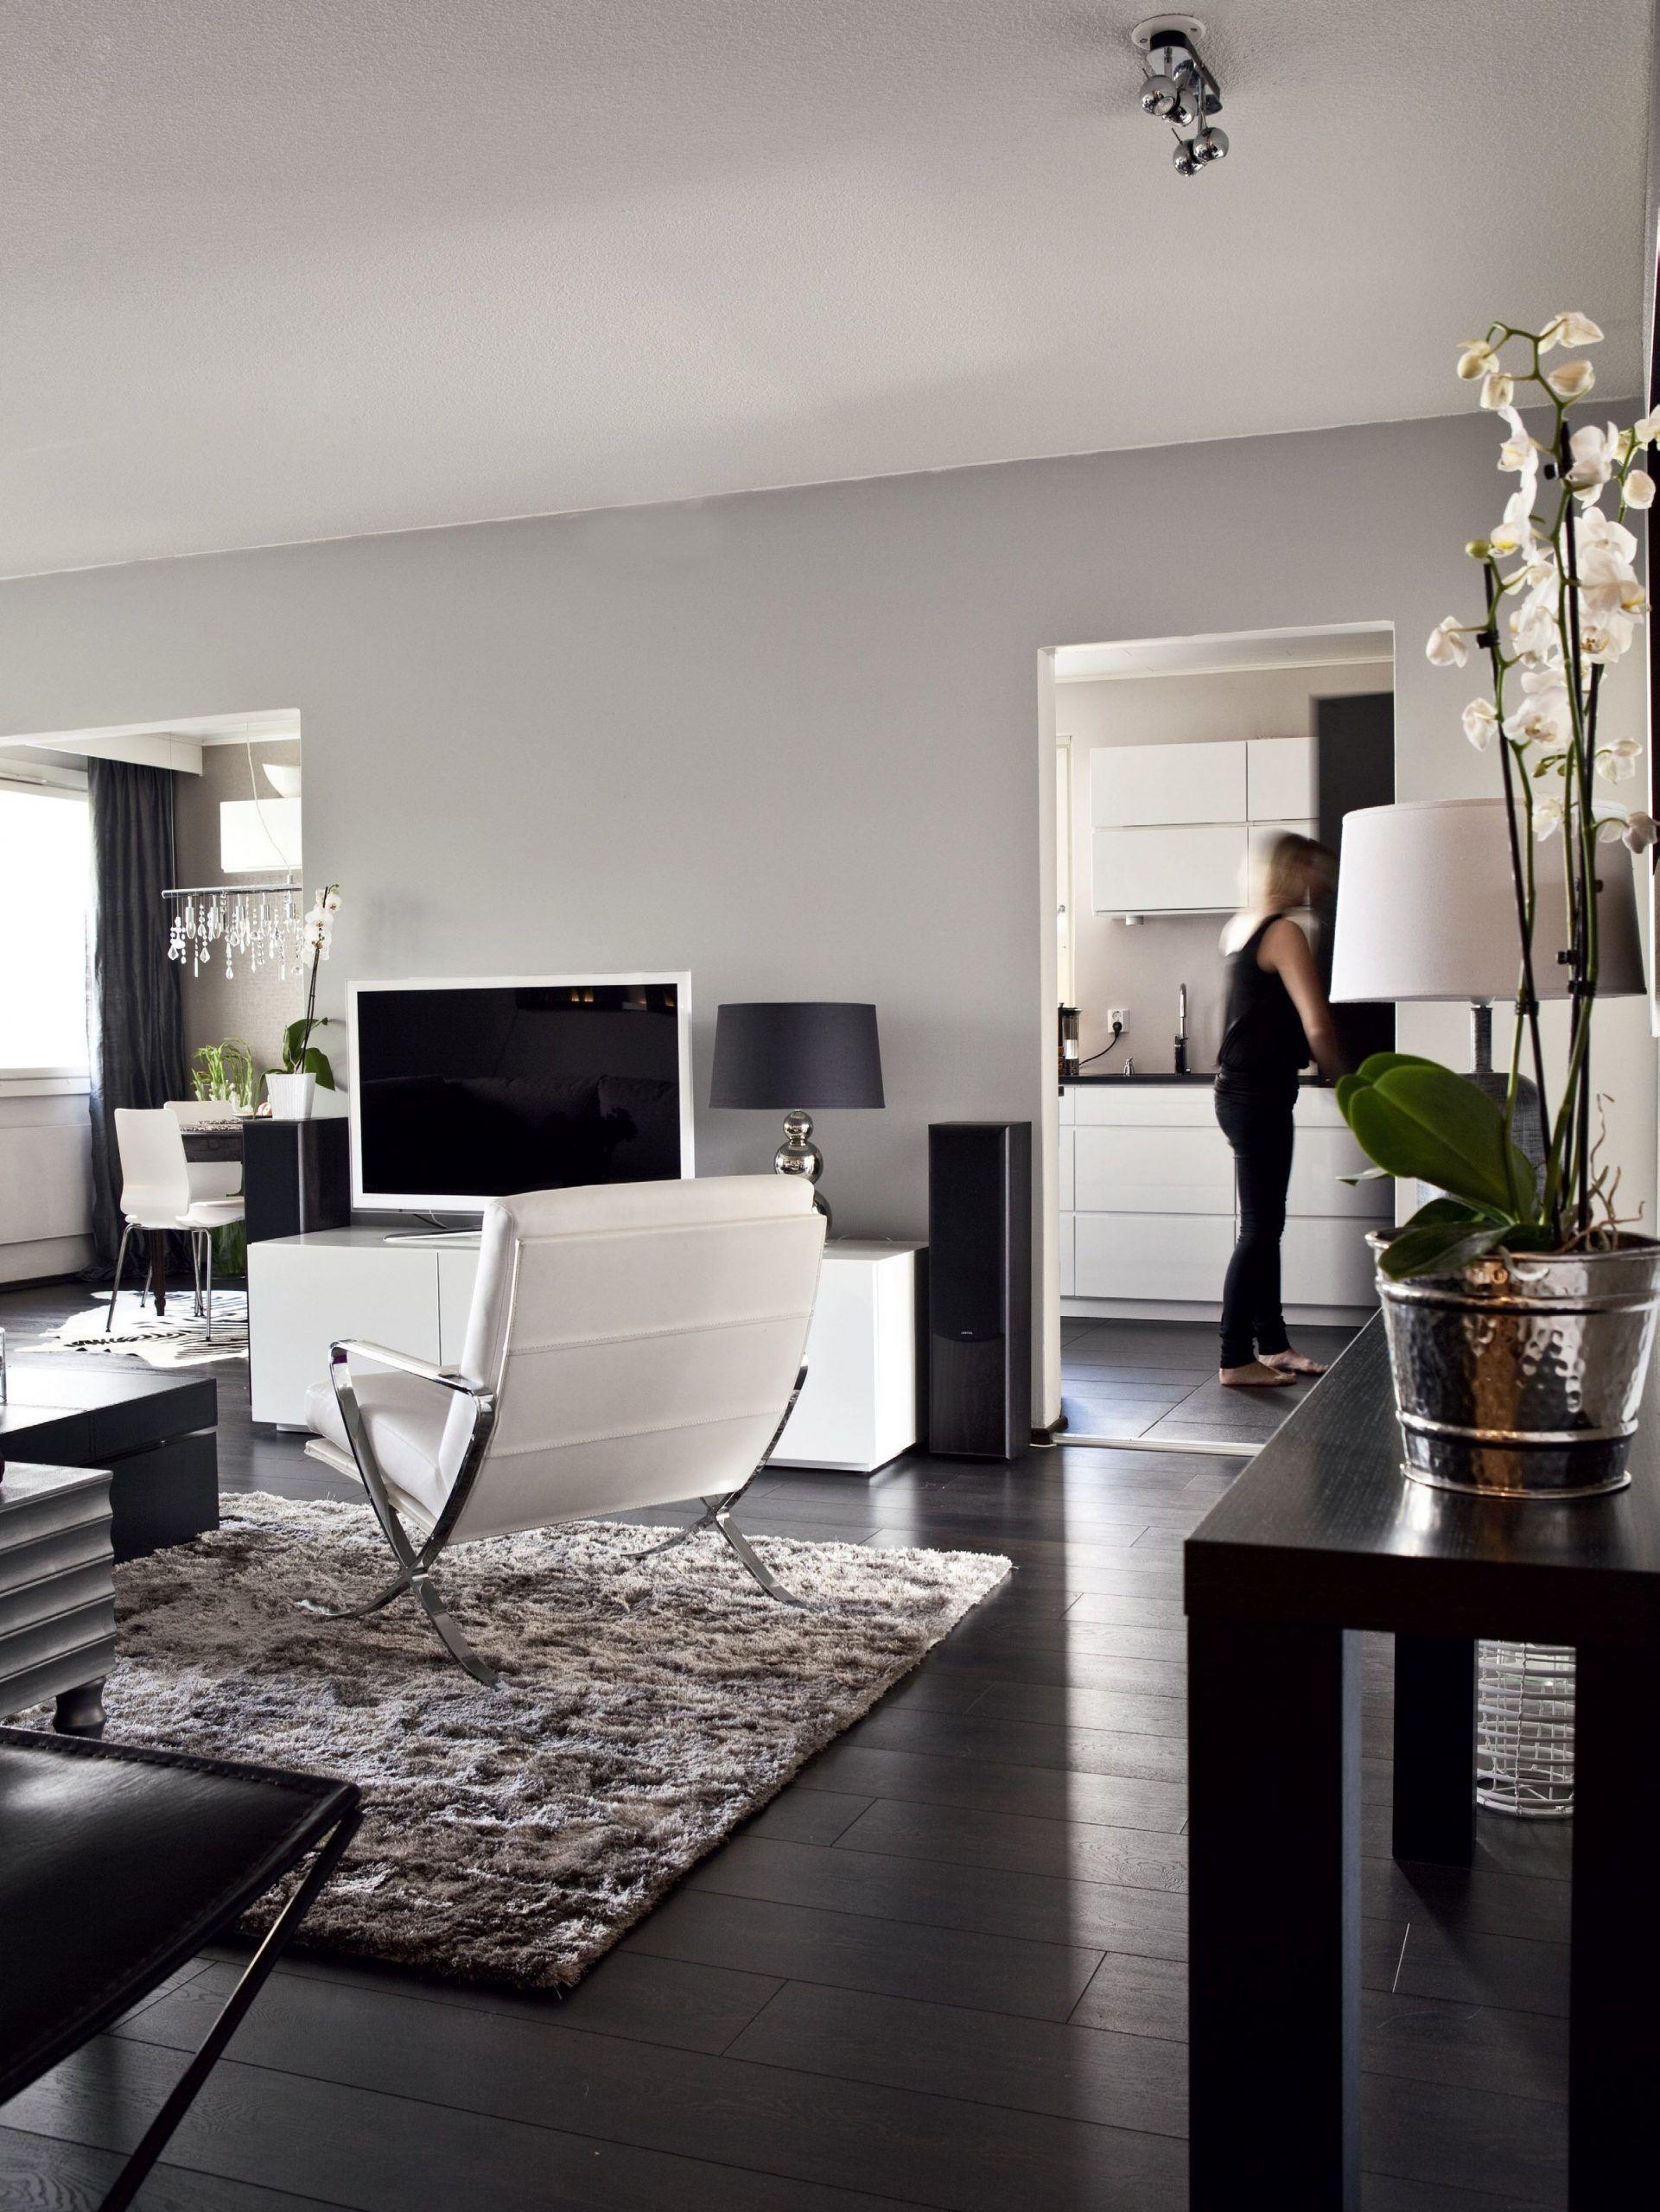 Dark Wood Bedrooms Ideas 10 Famous Dark Hardwood Floors Decorating Ideas In 2020 Dark Floor Living Room Wooden Floors Living Room Dark Hardwood Floors Living Room